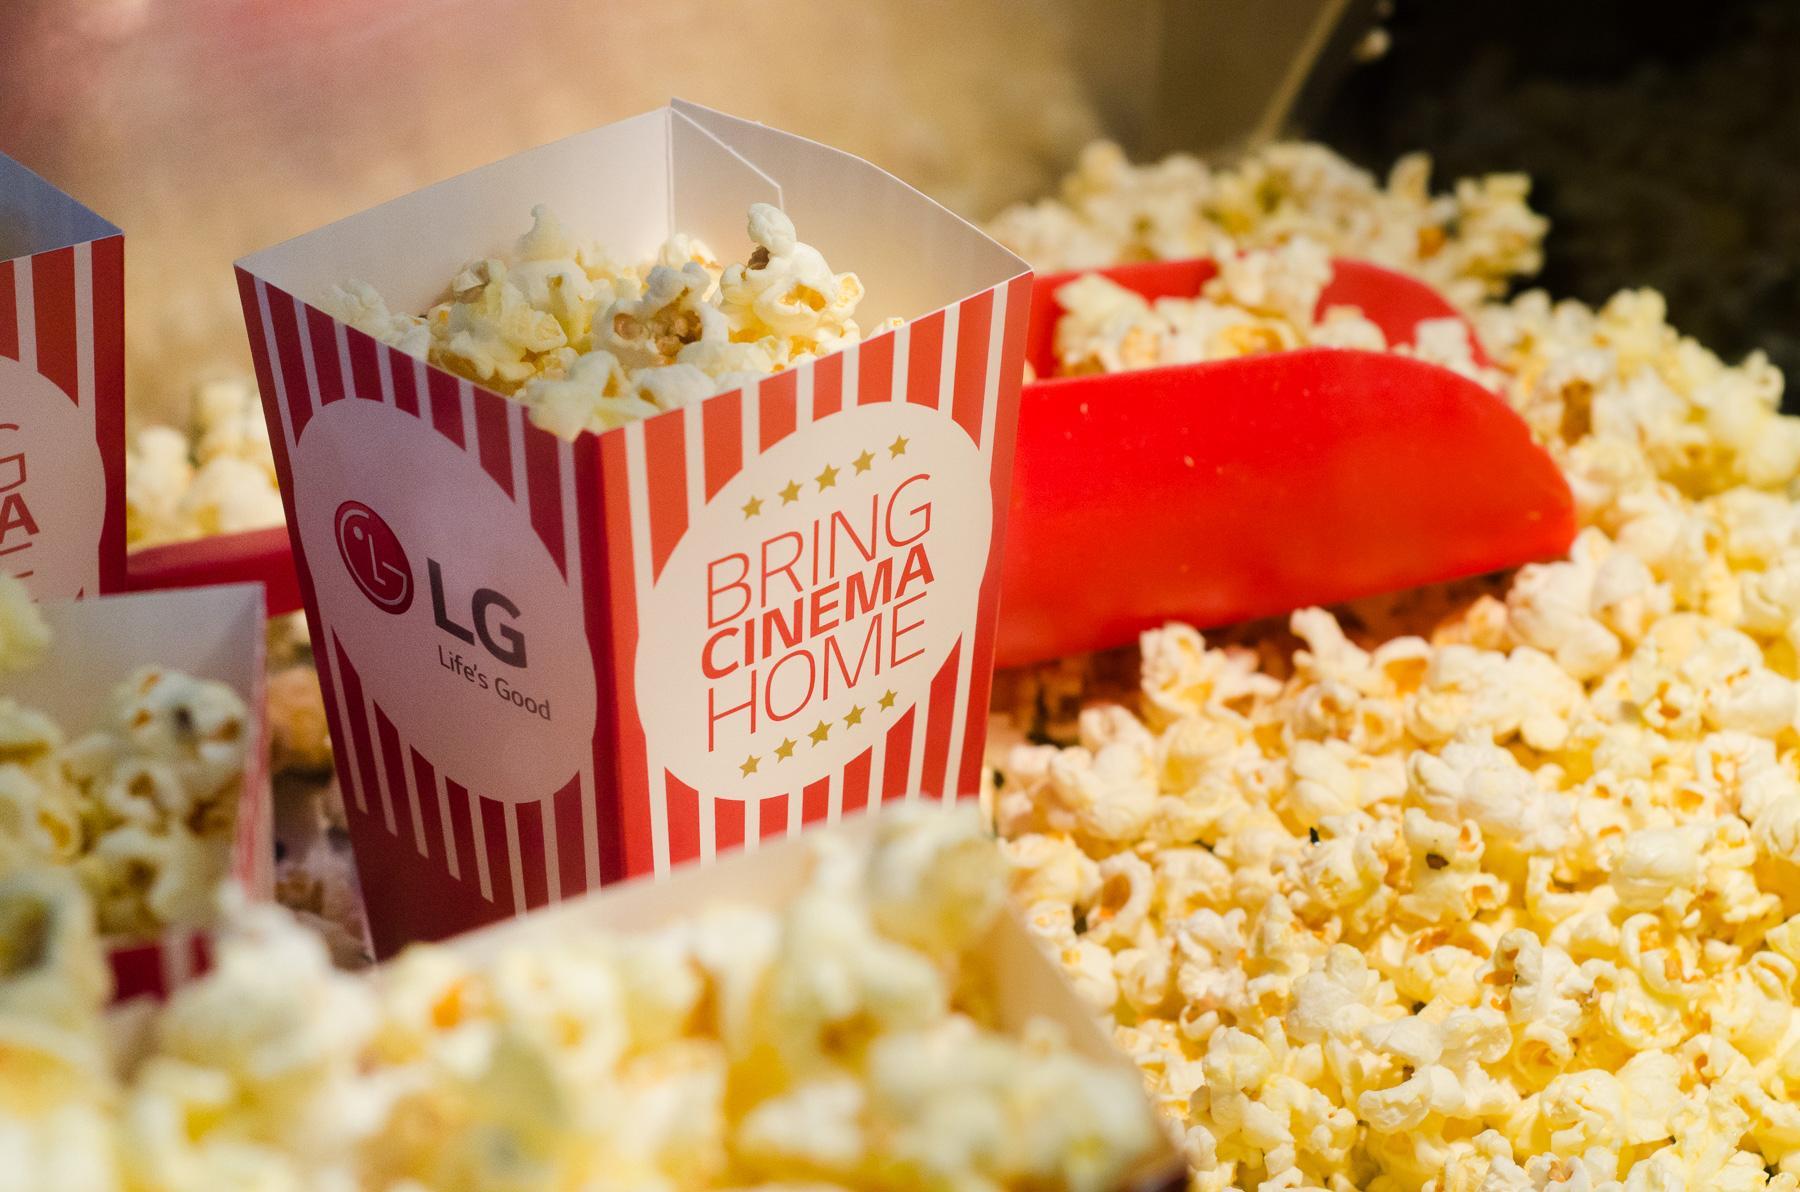 LG Experiential Ad - Bring Cinema Home